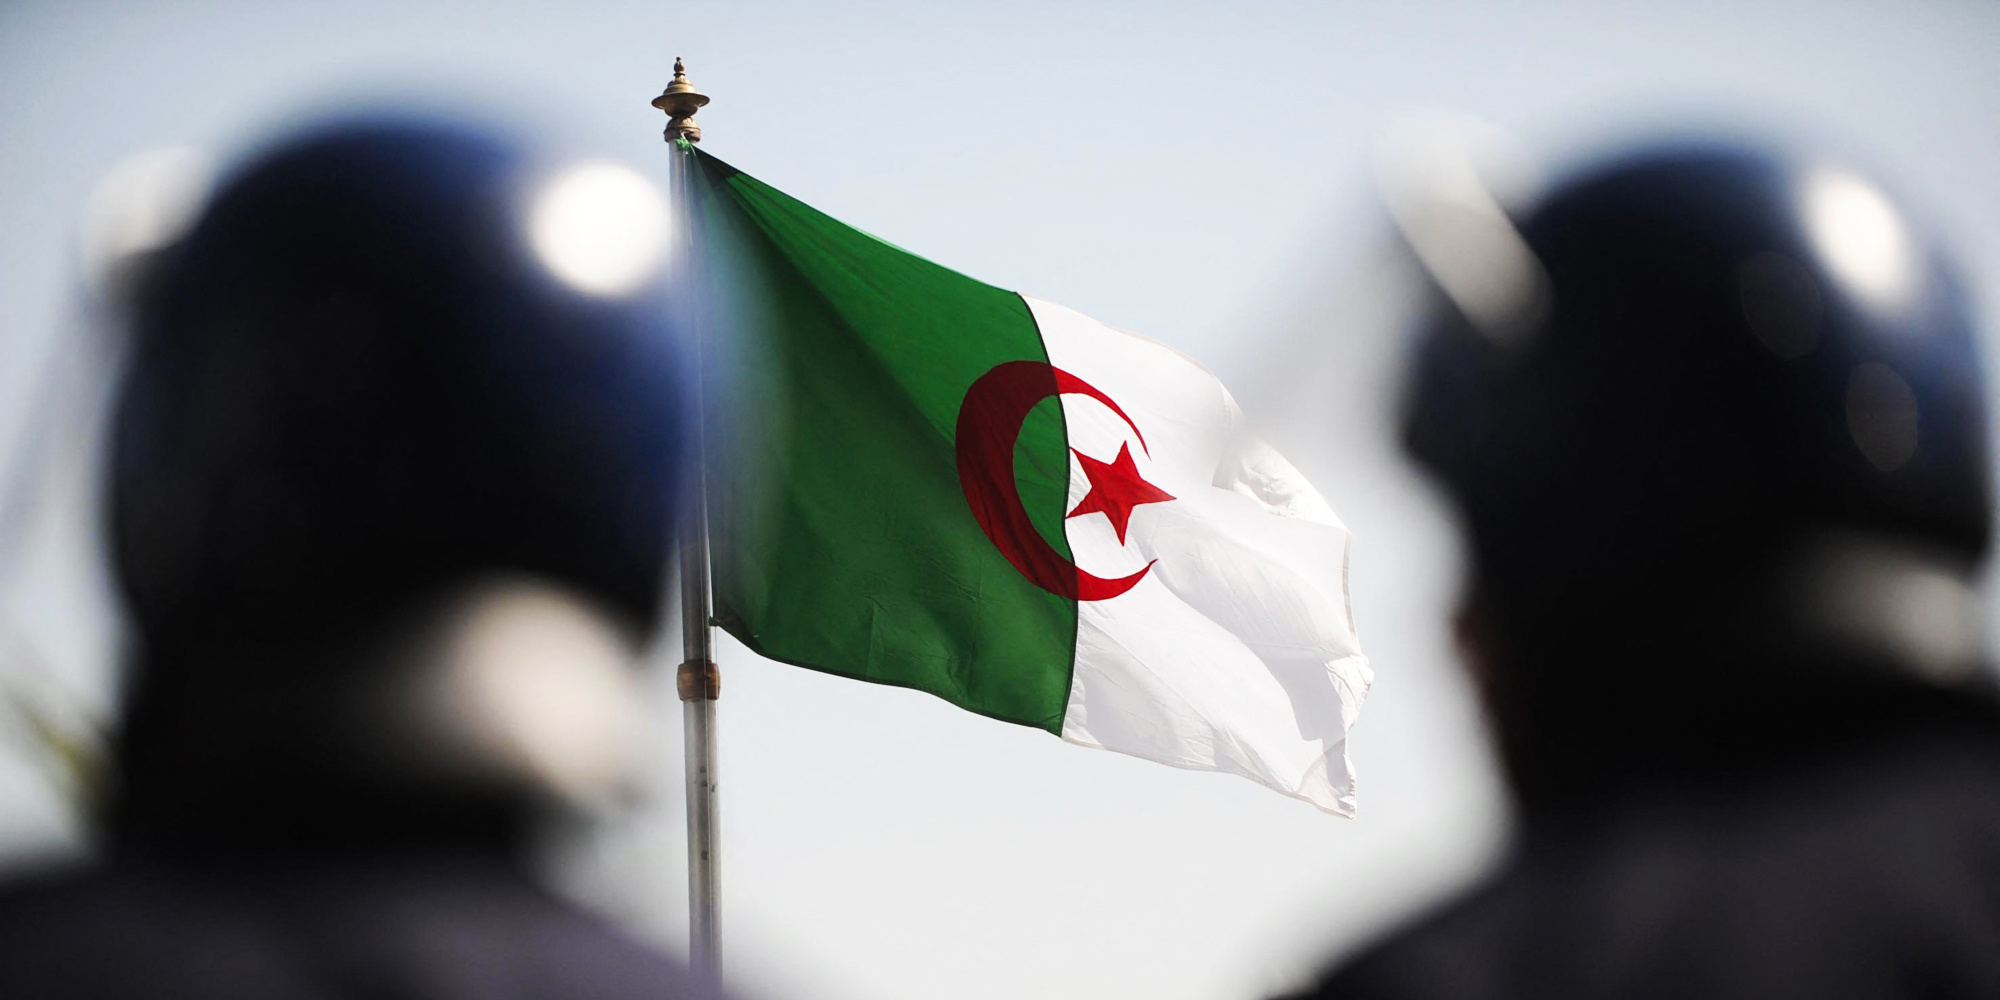 Algeria Summons French Envoy over Visa Restriction Decision